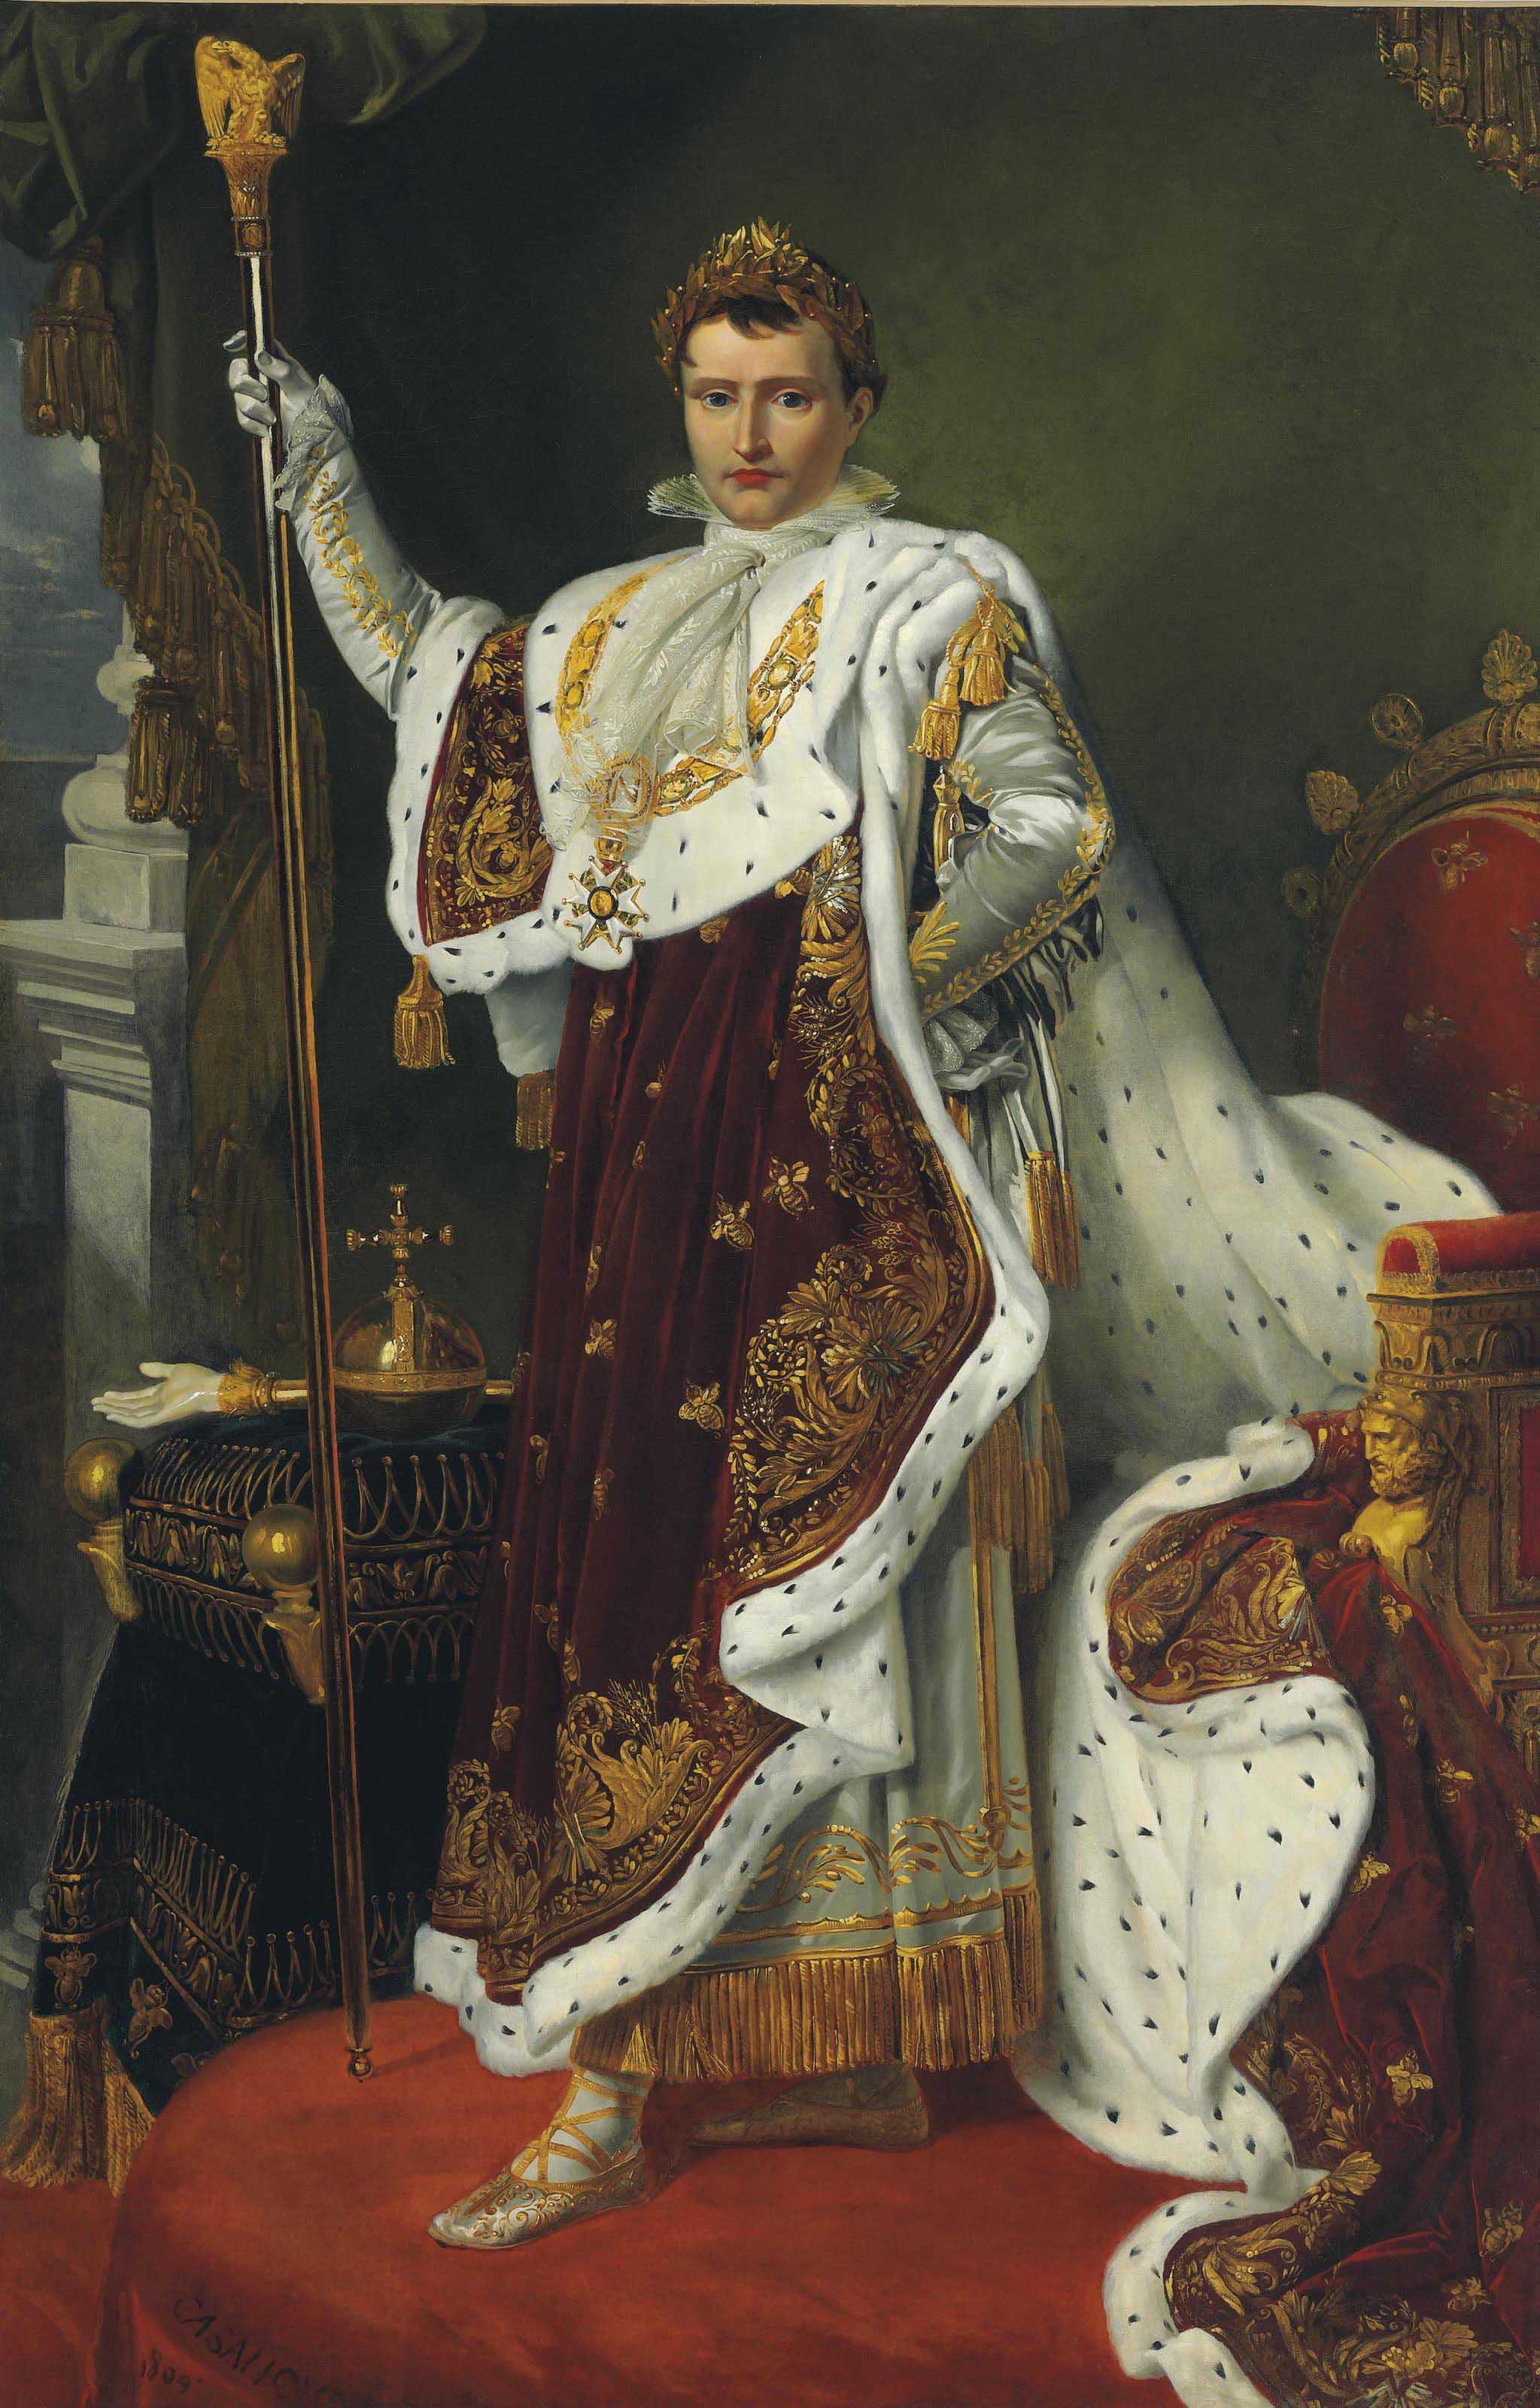 Audio: Alexandre Benoit Jean Dufay, Casanova's Portrait of the Emperor Napoleon Bonaparte